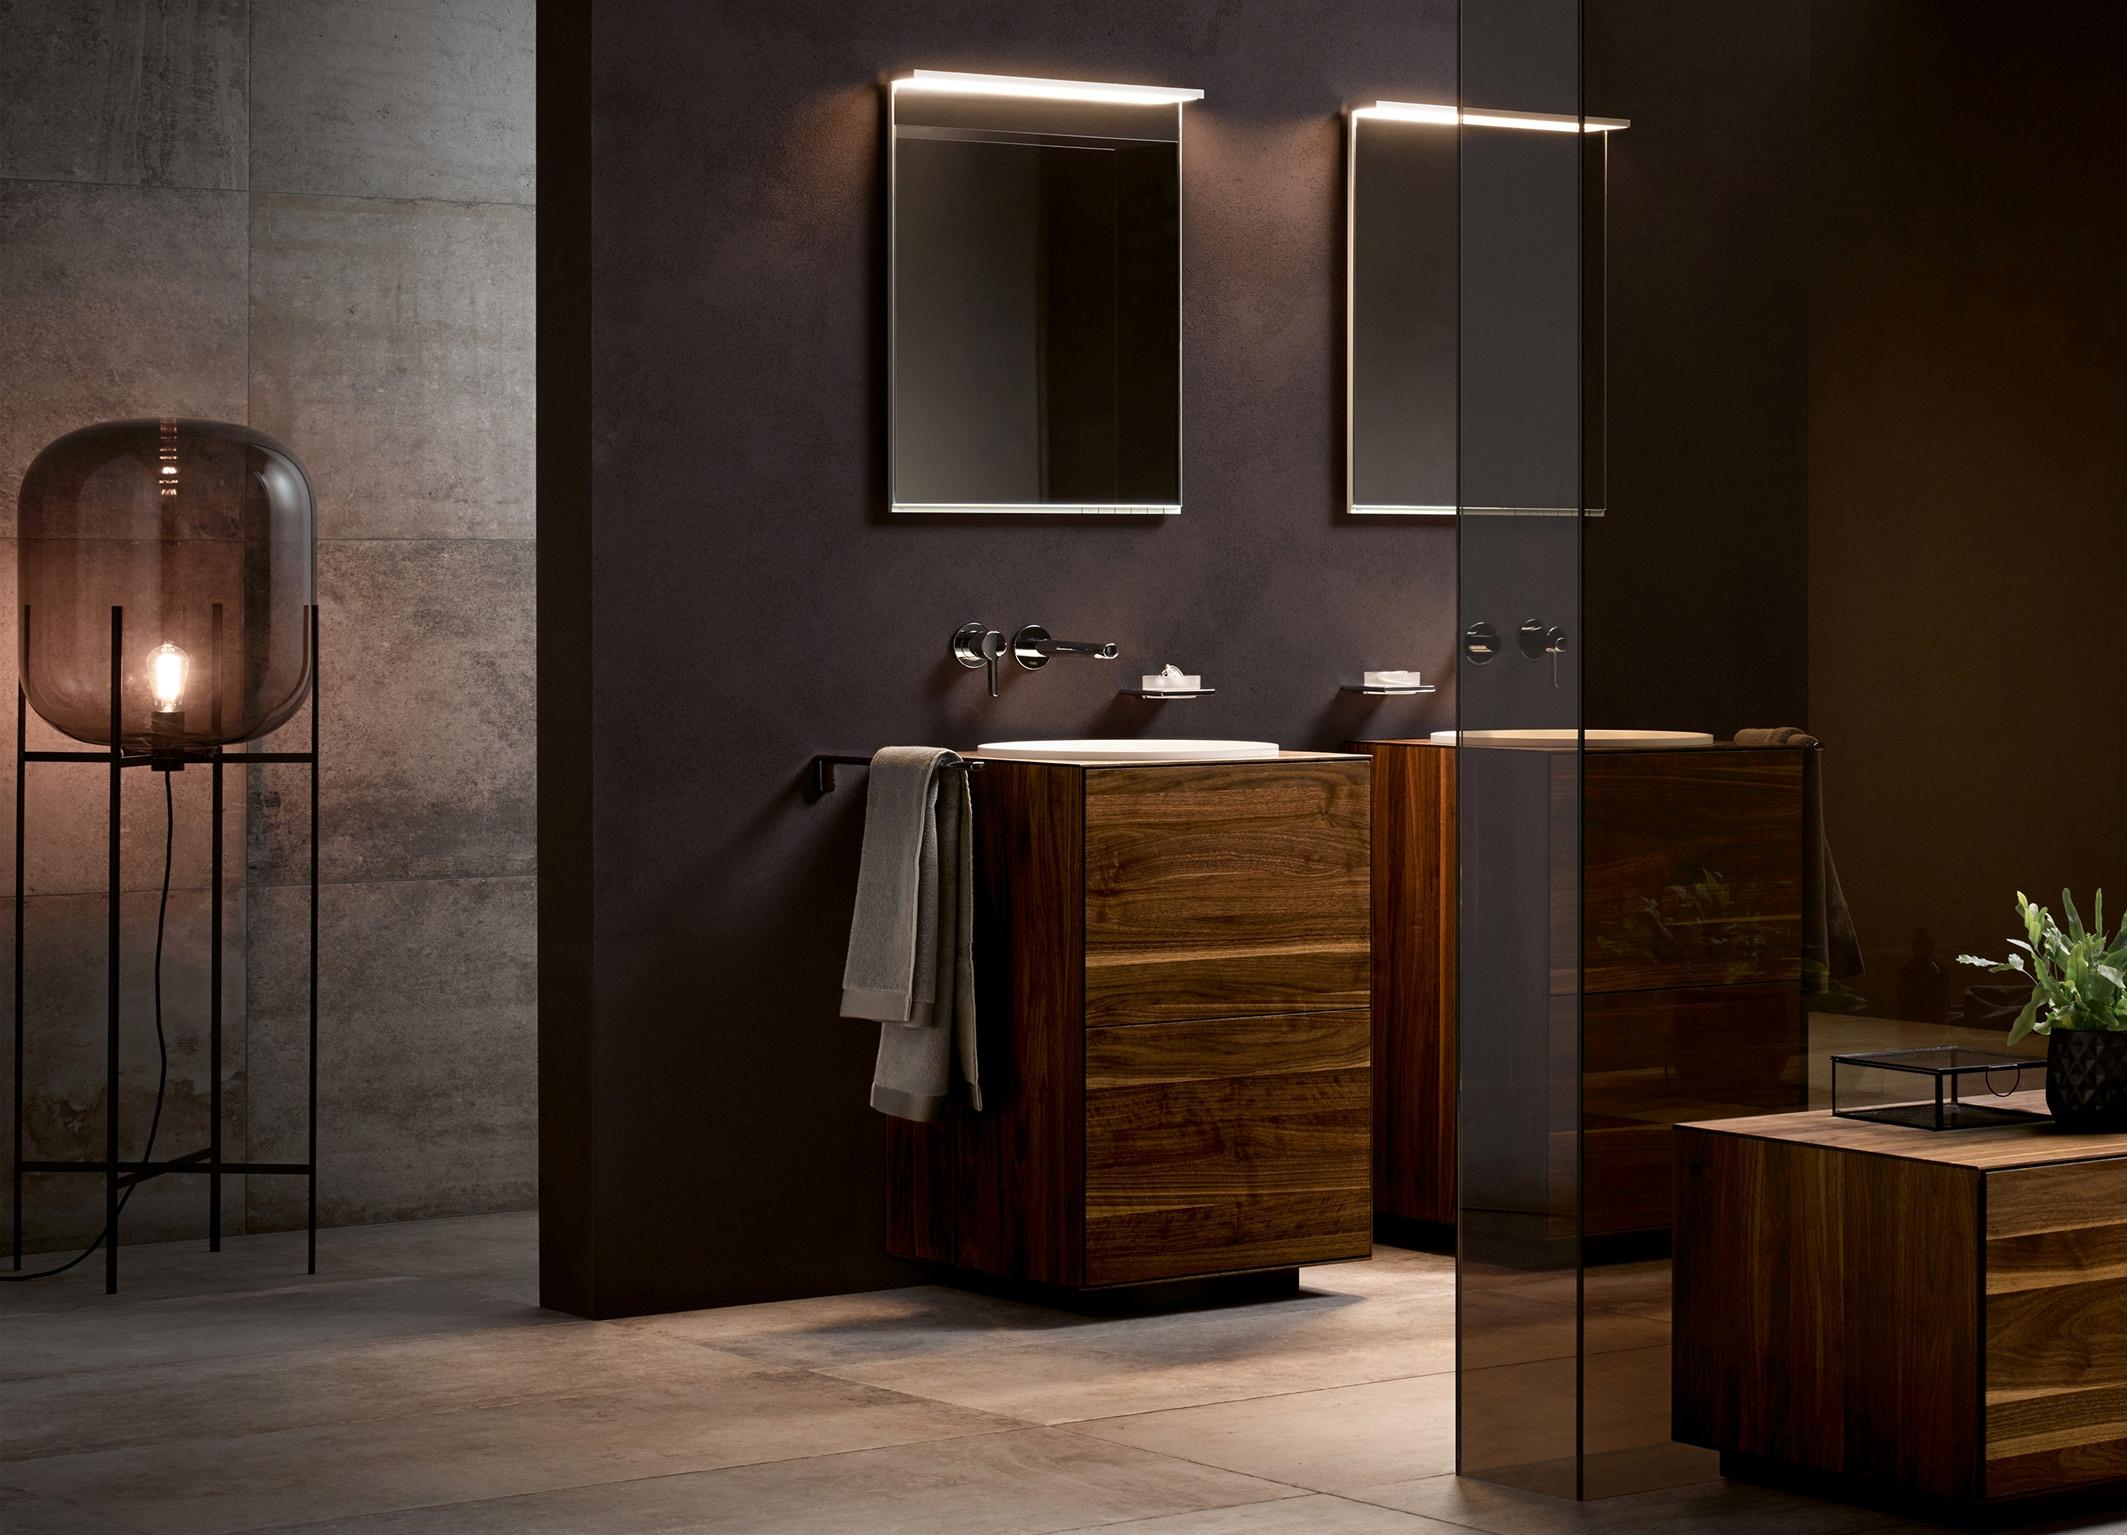 lichtspektakel im badezimmer hwz. Black Bedroom Furniture Sets. Home Design Ideas